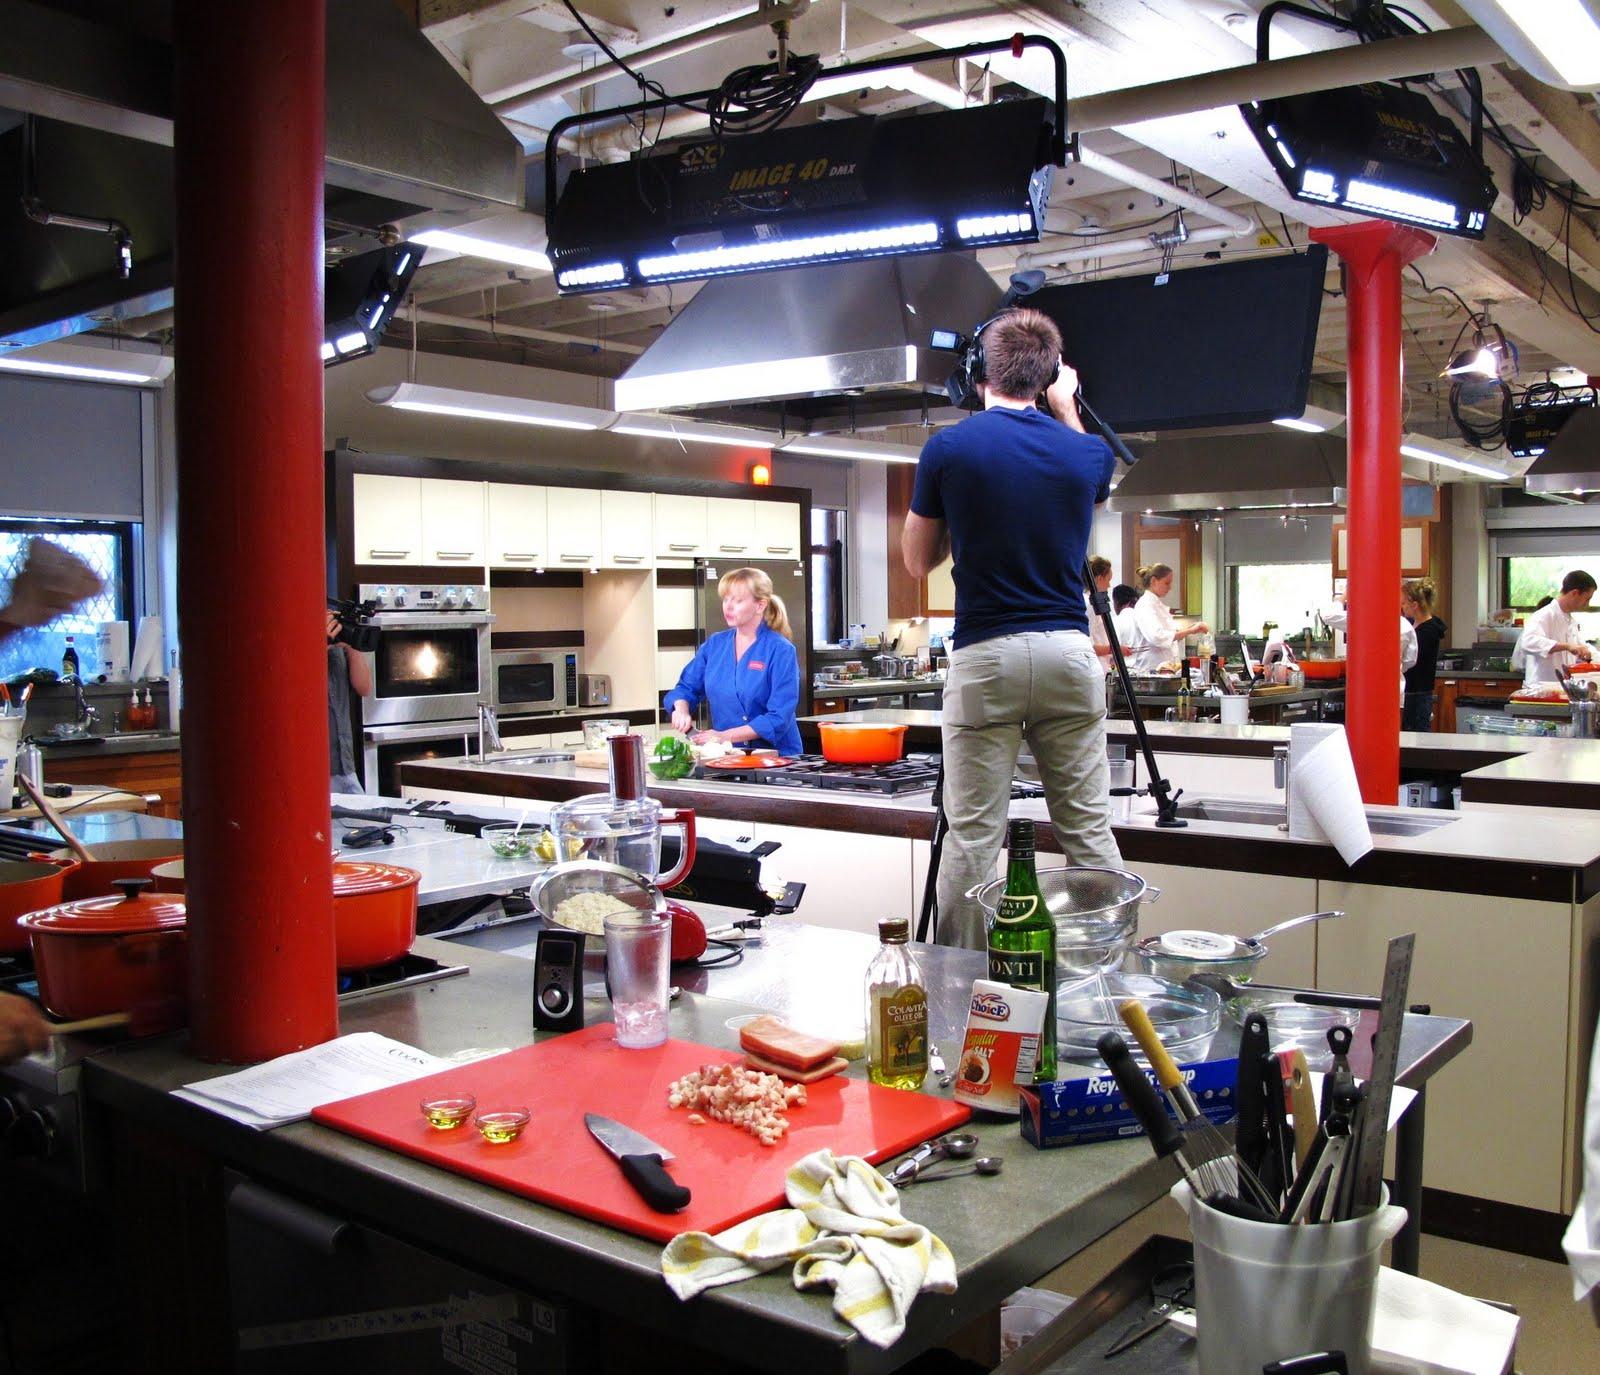 The Small Boston Kitchen: A Sneak Peek Of America's Test